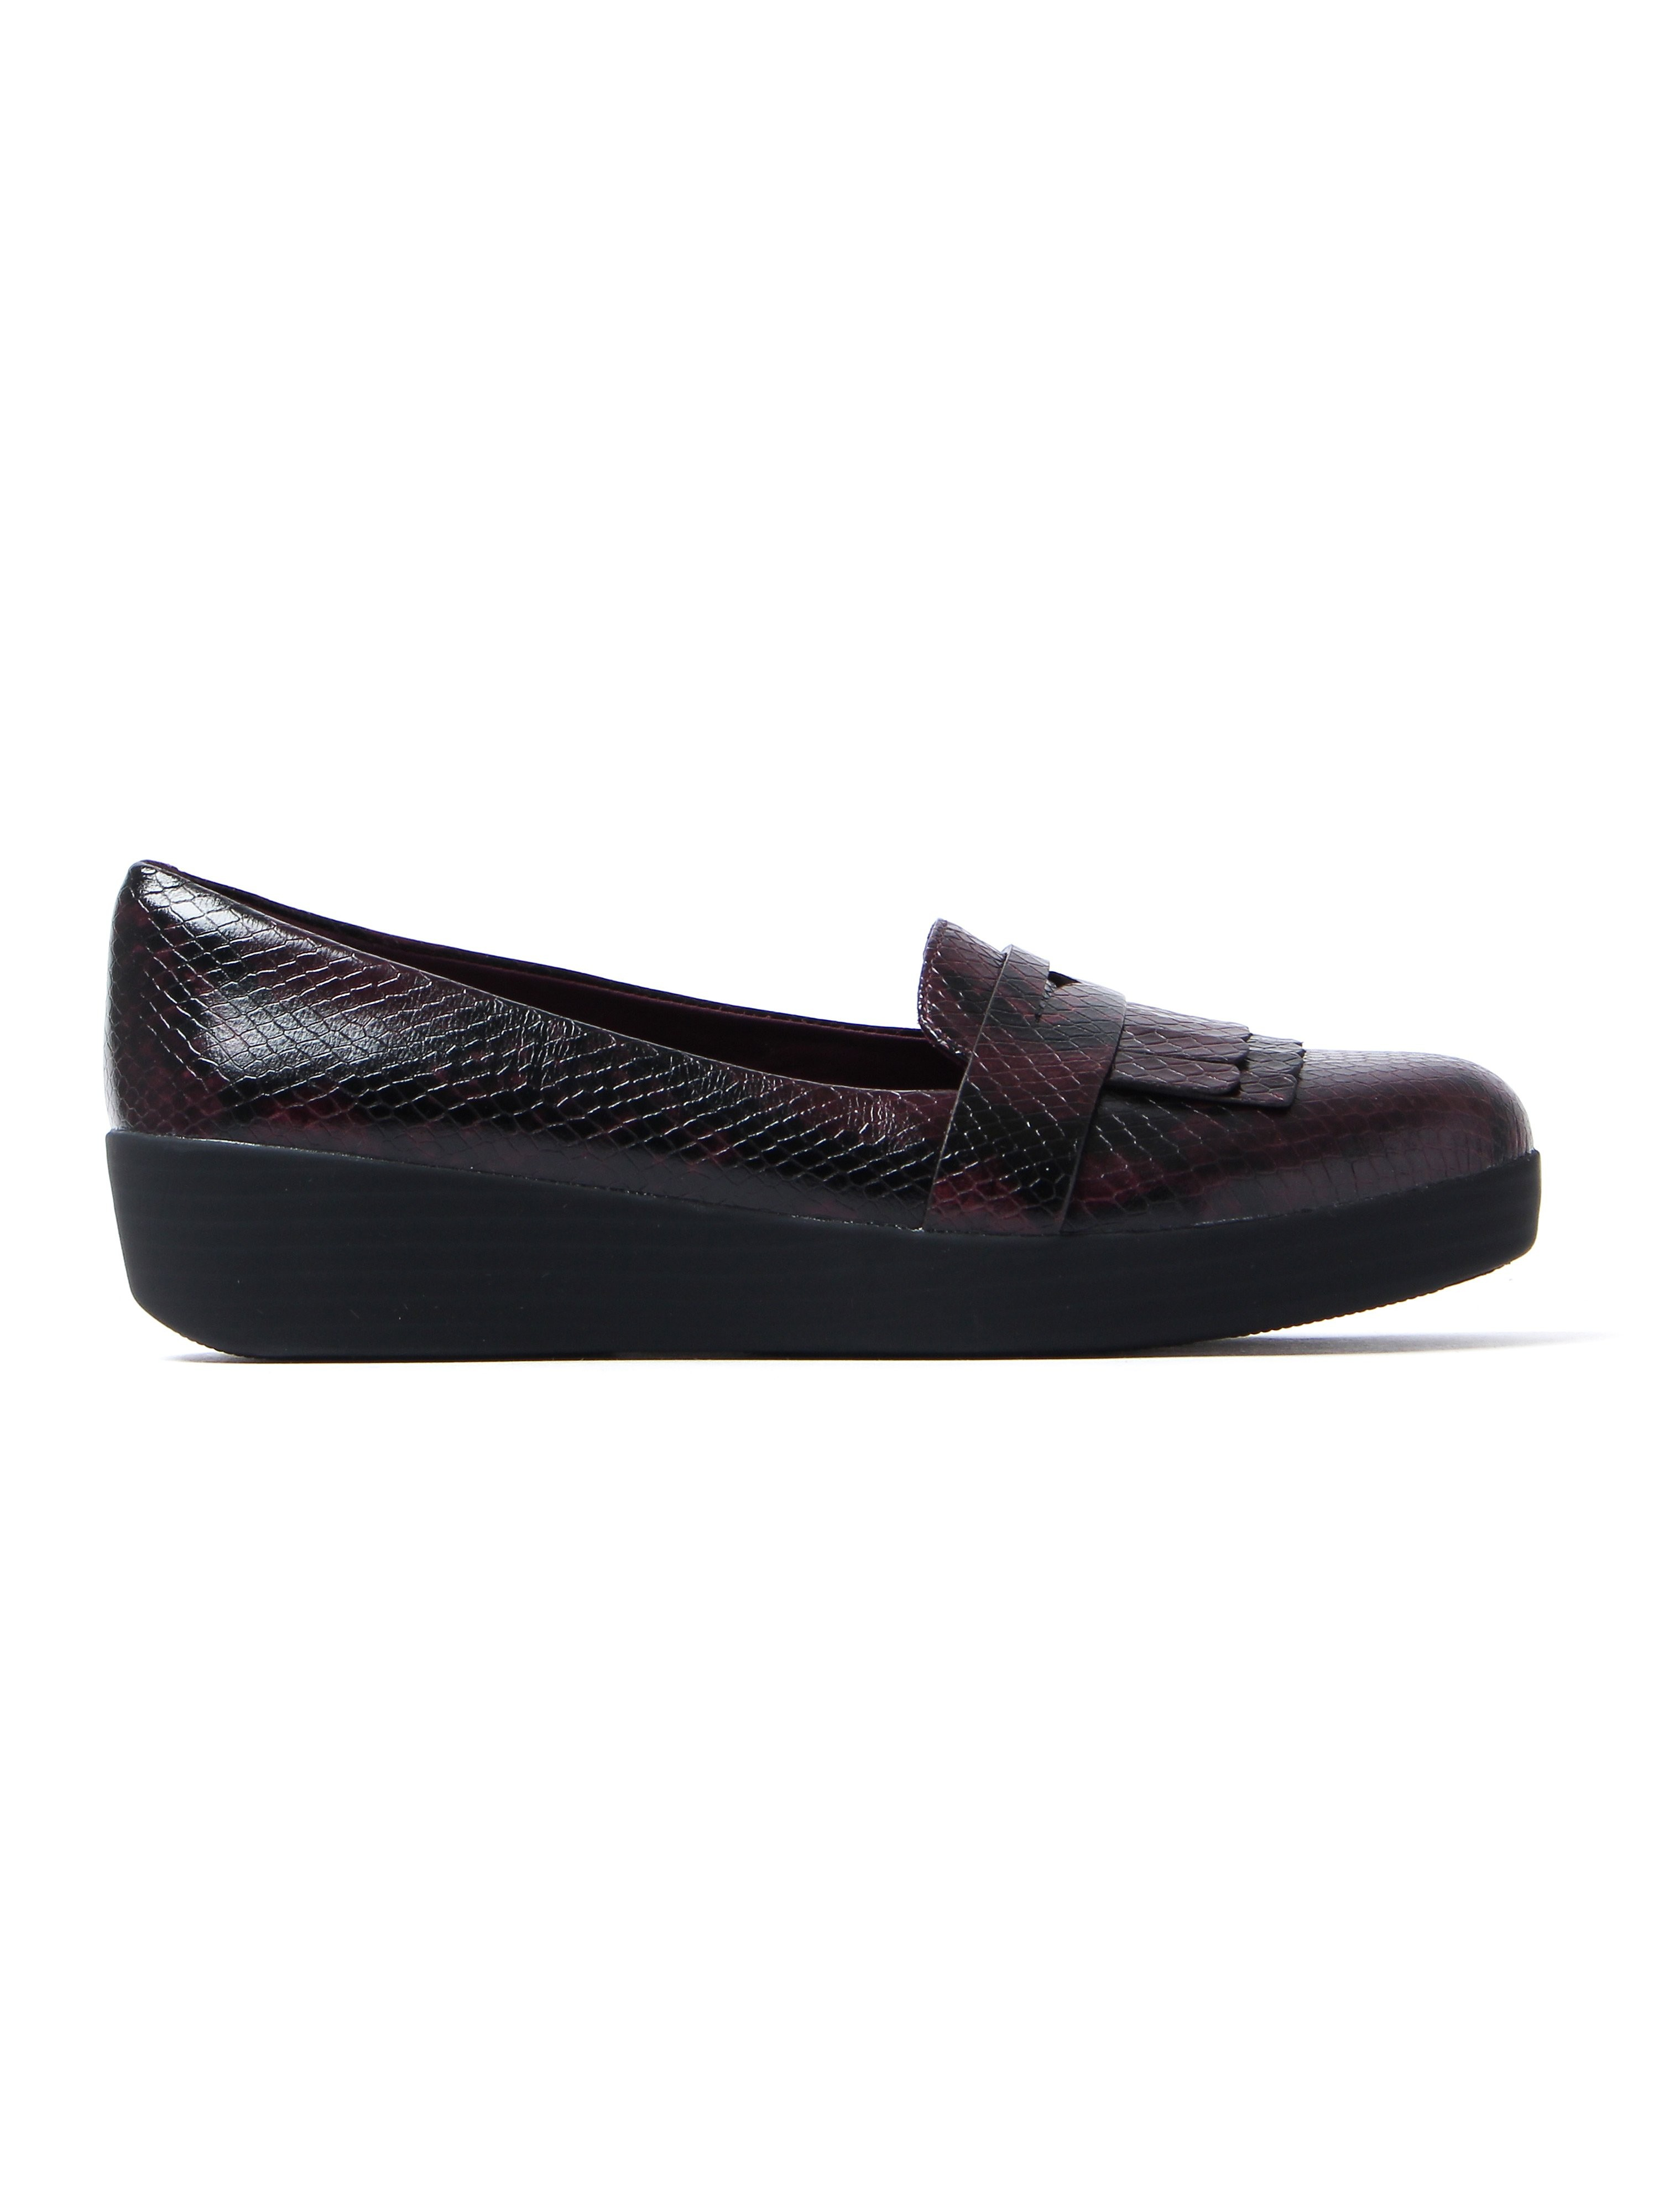 FitFlop Women's Fringey Sneaker Loafers - Deep Plum Leather